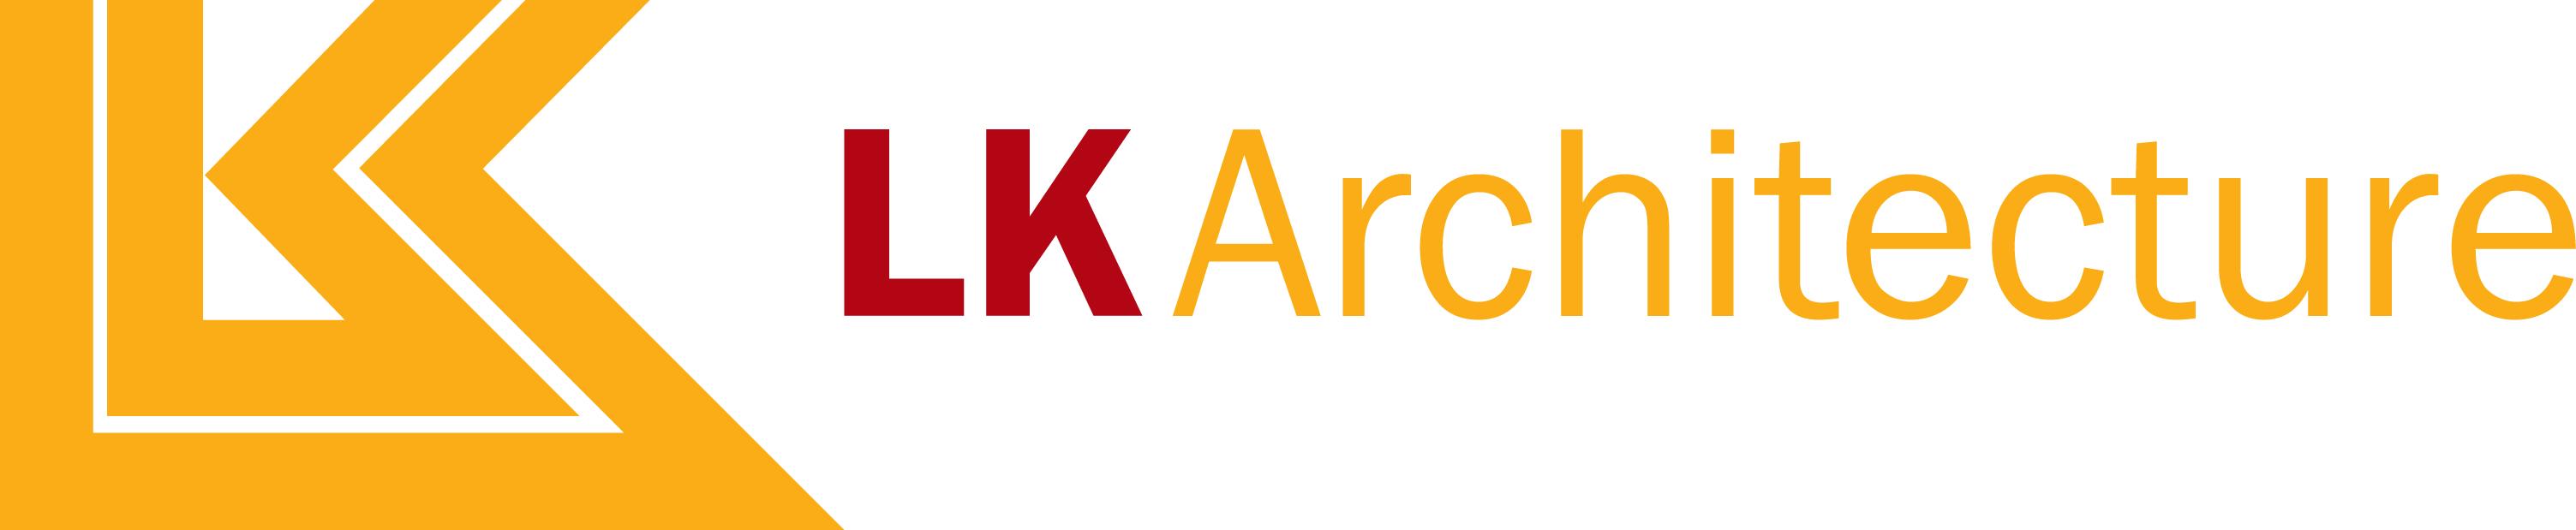 LK Architecture